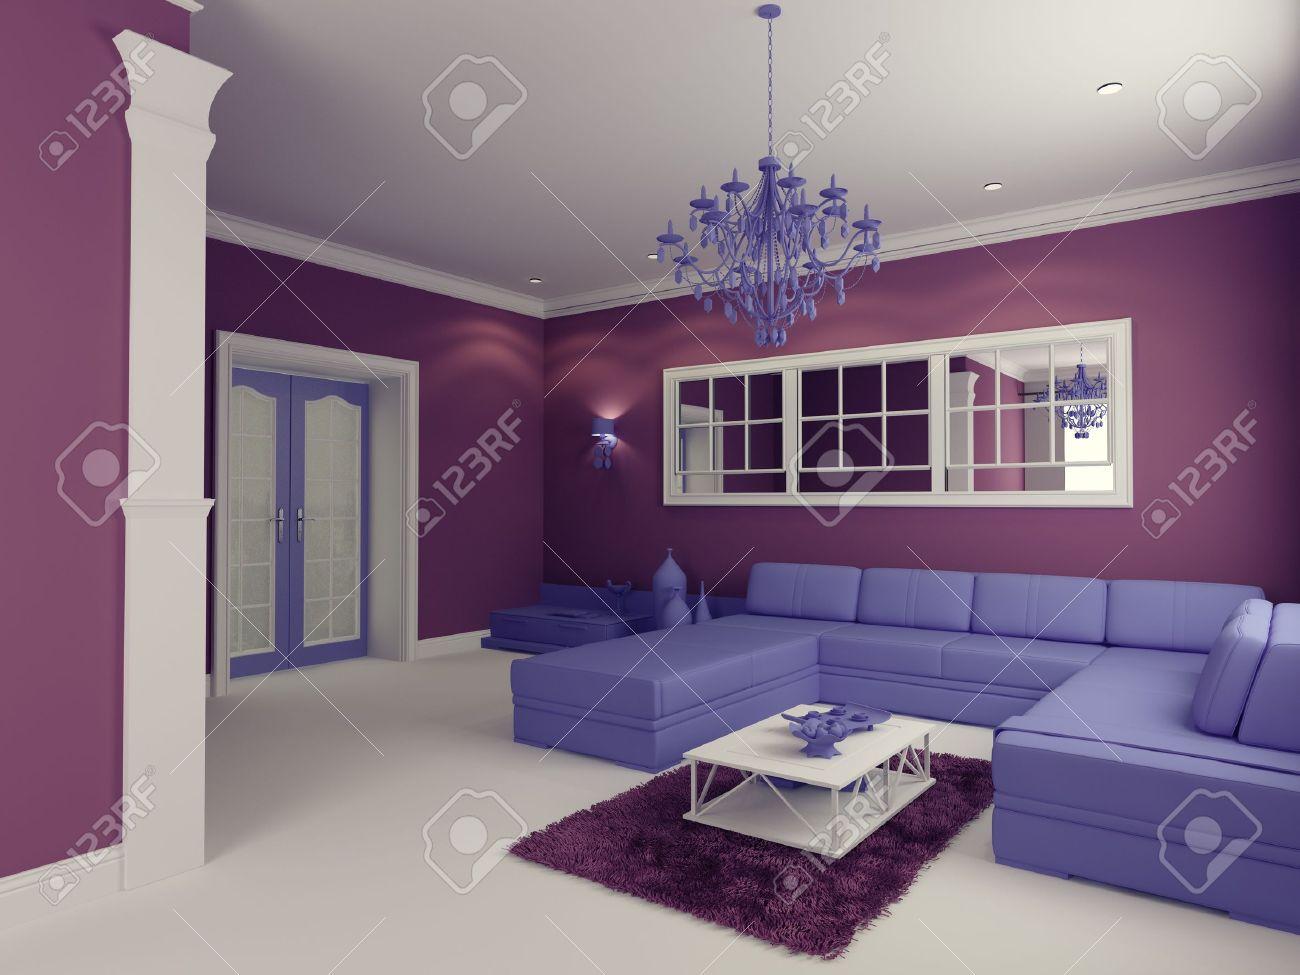 cartoon-style modern living room interior (computer generated image) Stock Photo - 9863006